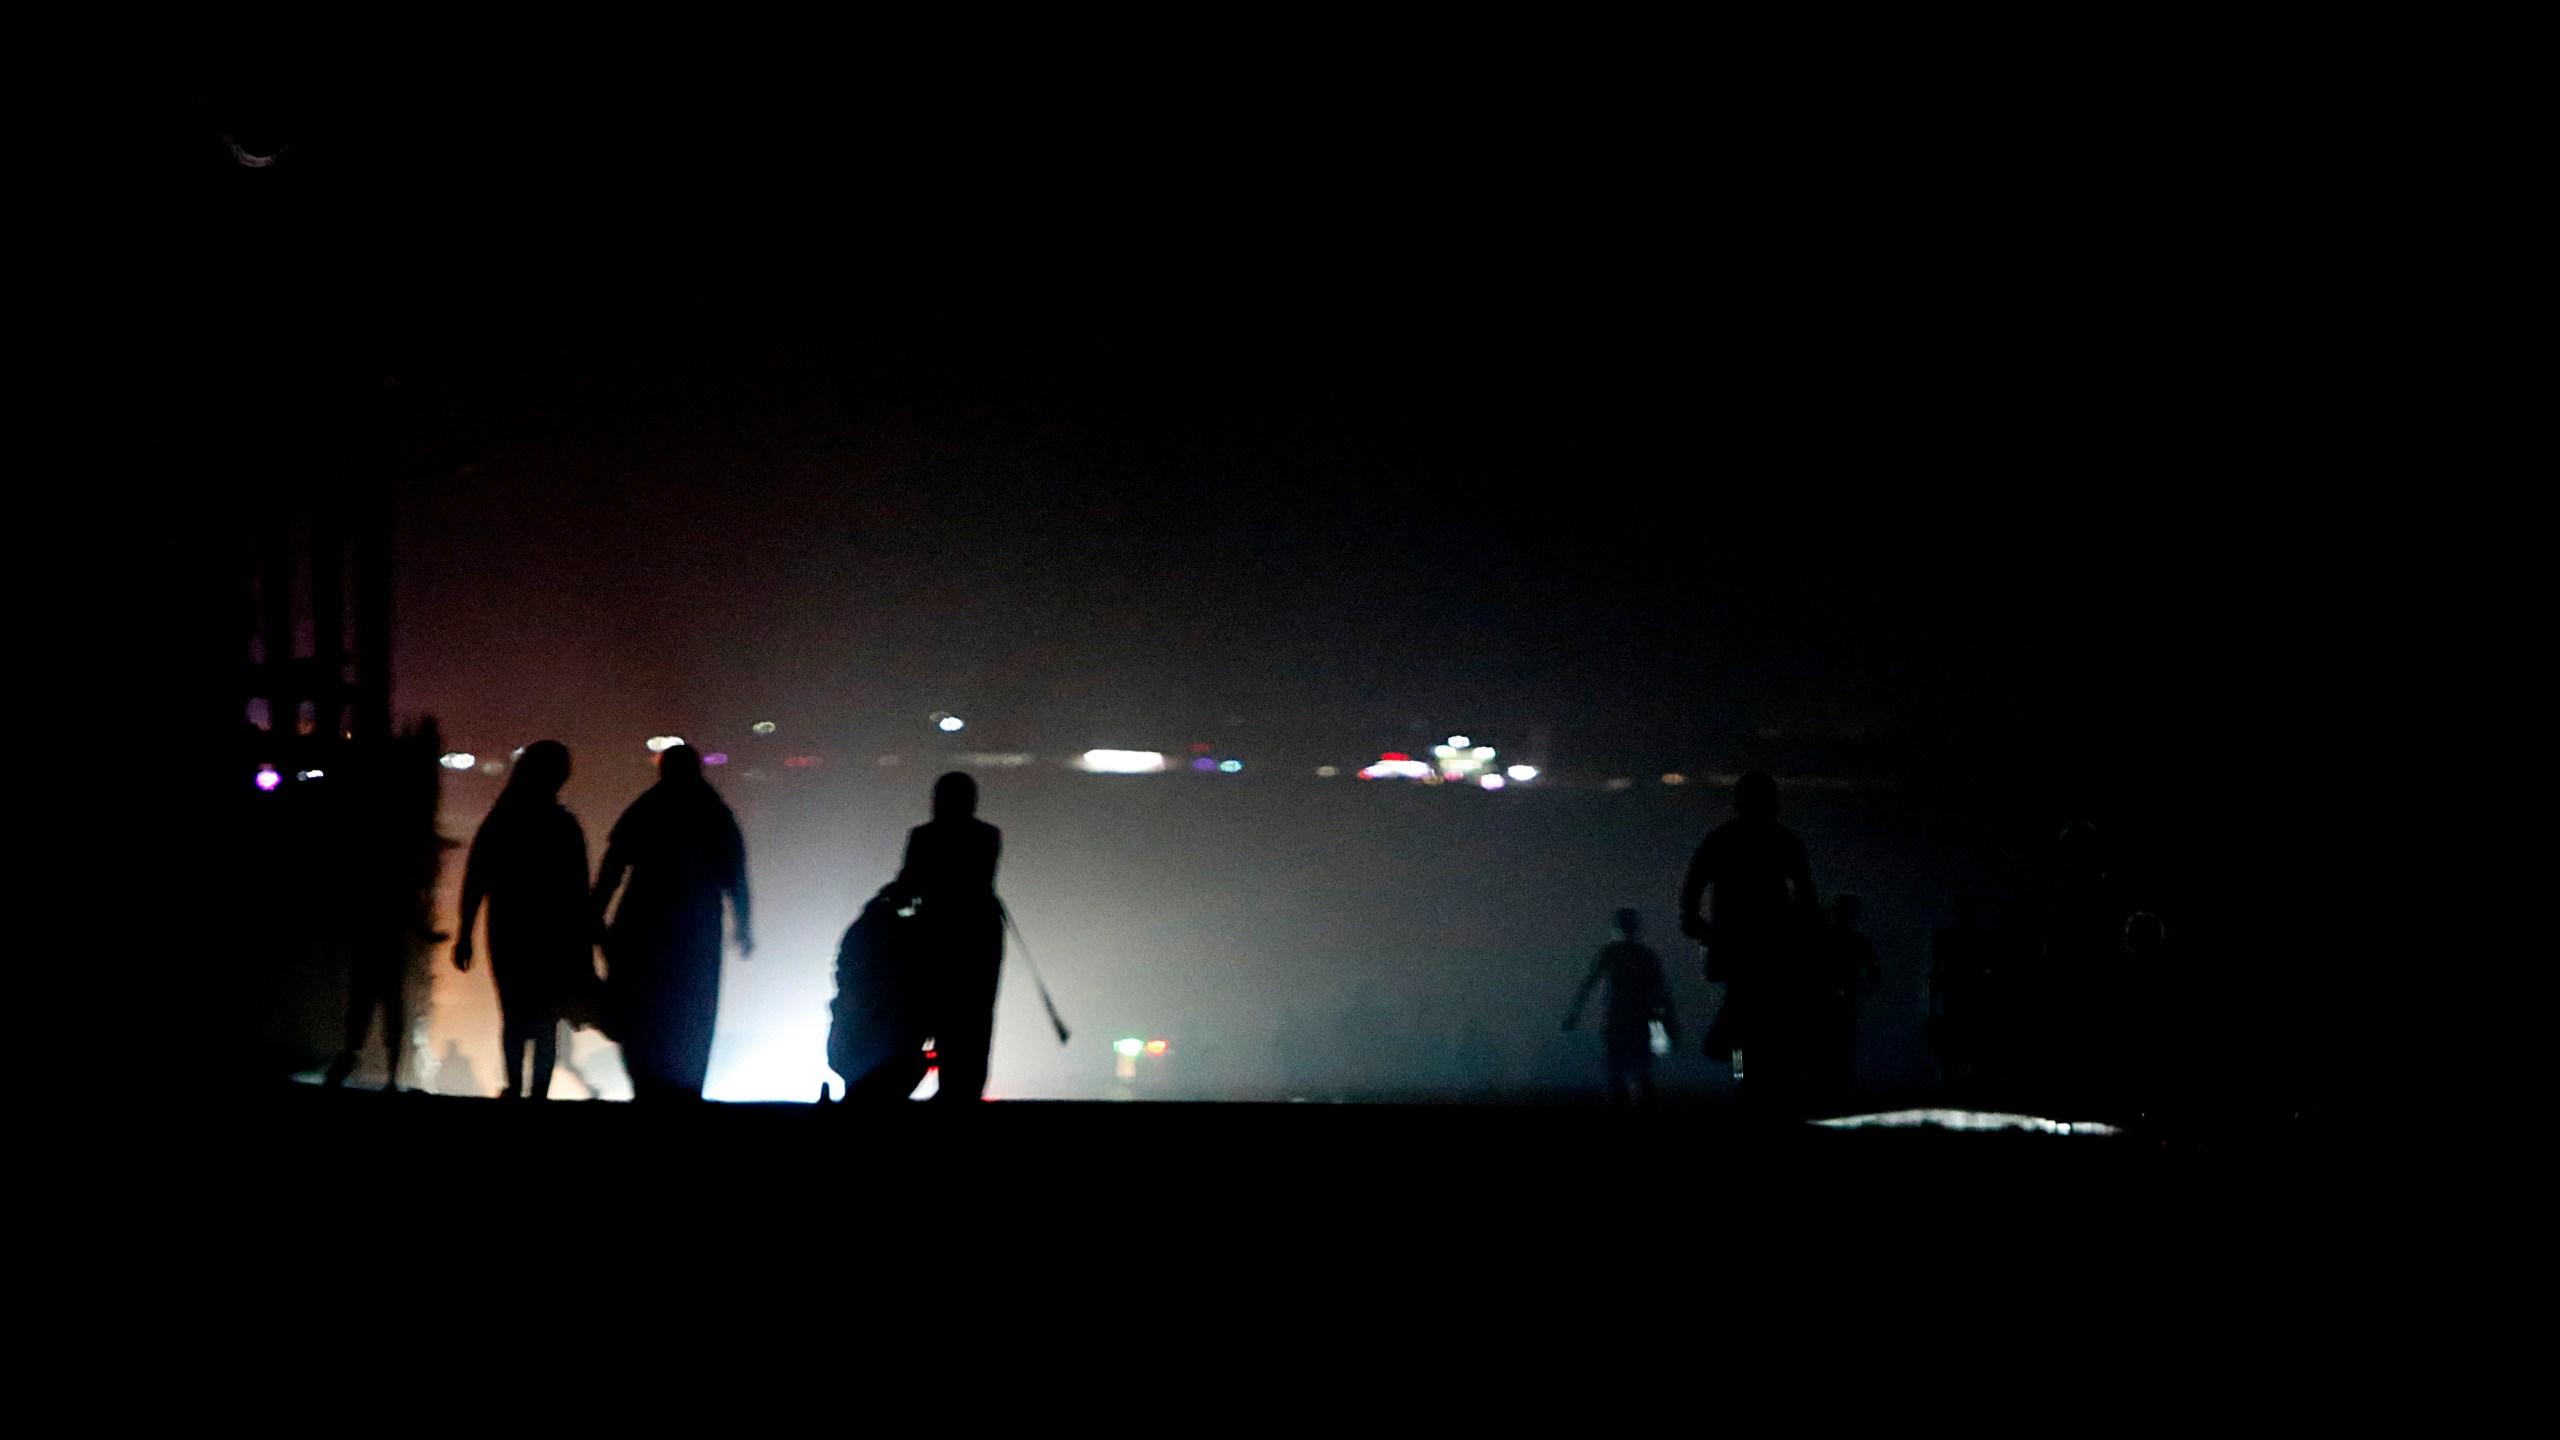 Israeli Strike Christmas 2020 Gaza militants fire 12 rockets, Israel strikes Hamas targets | ABC27